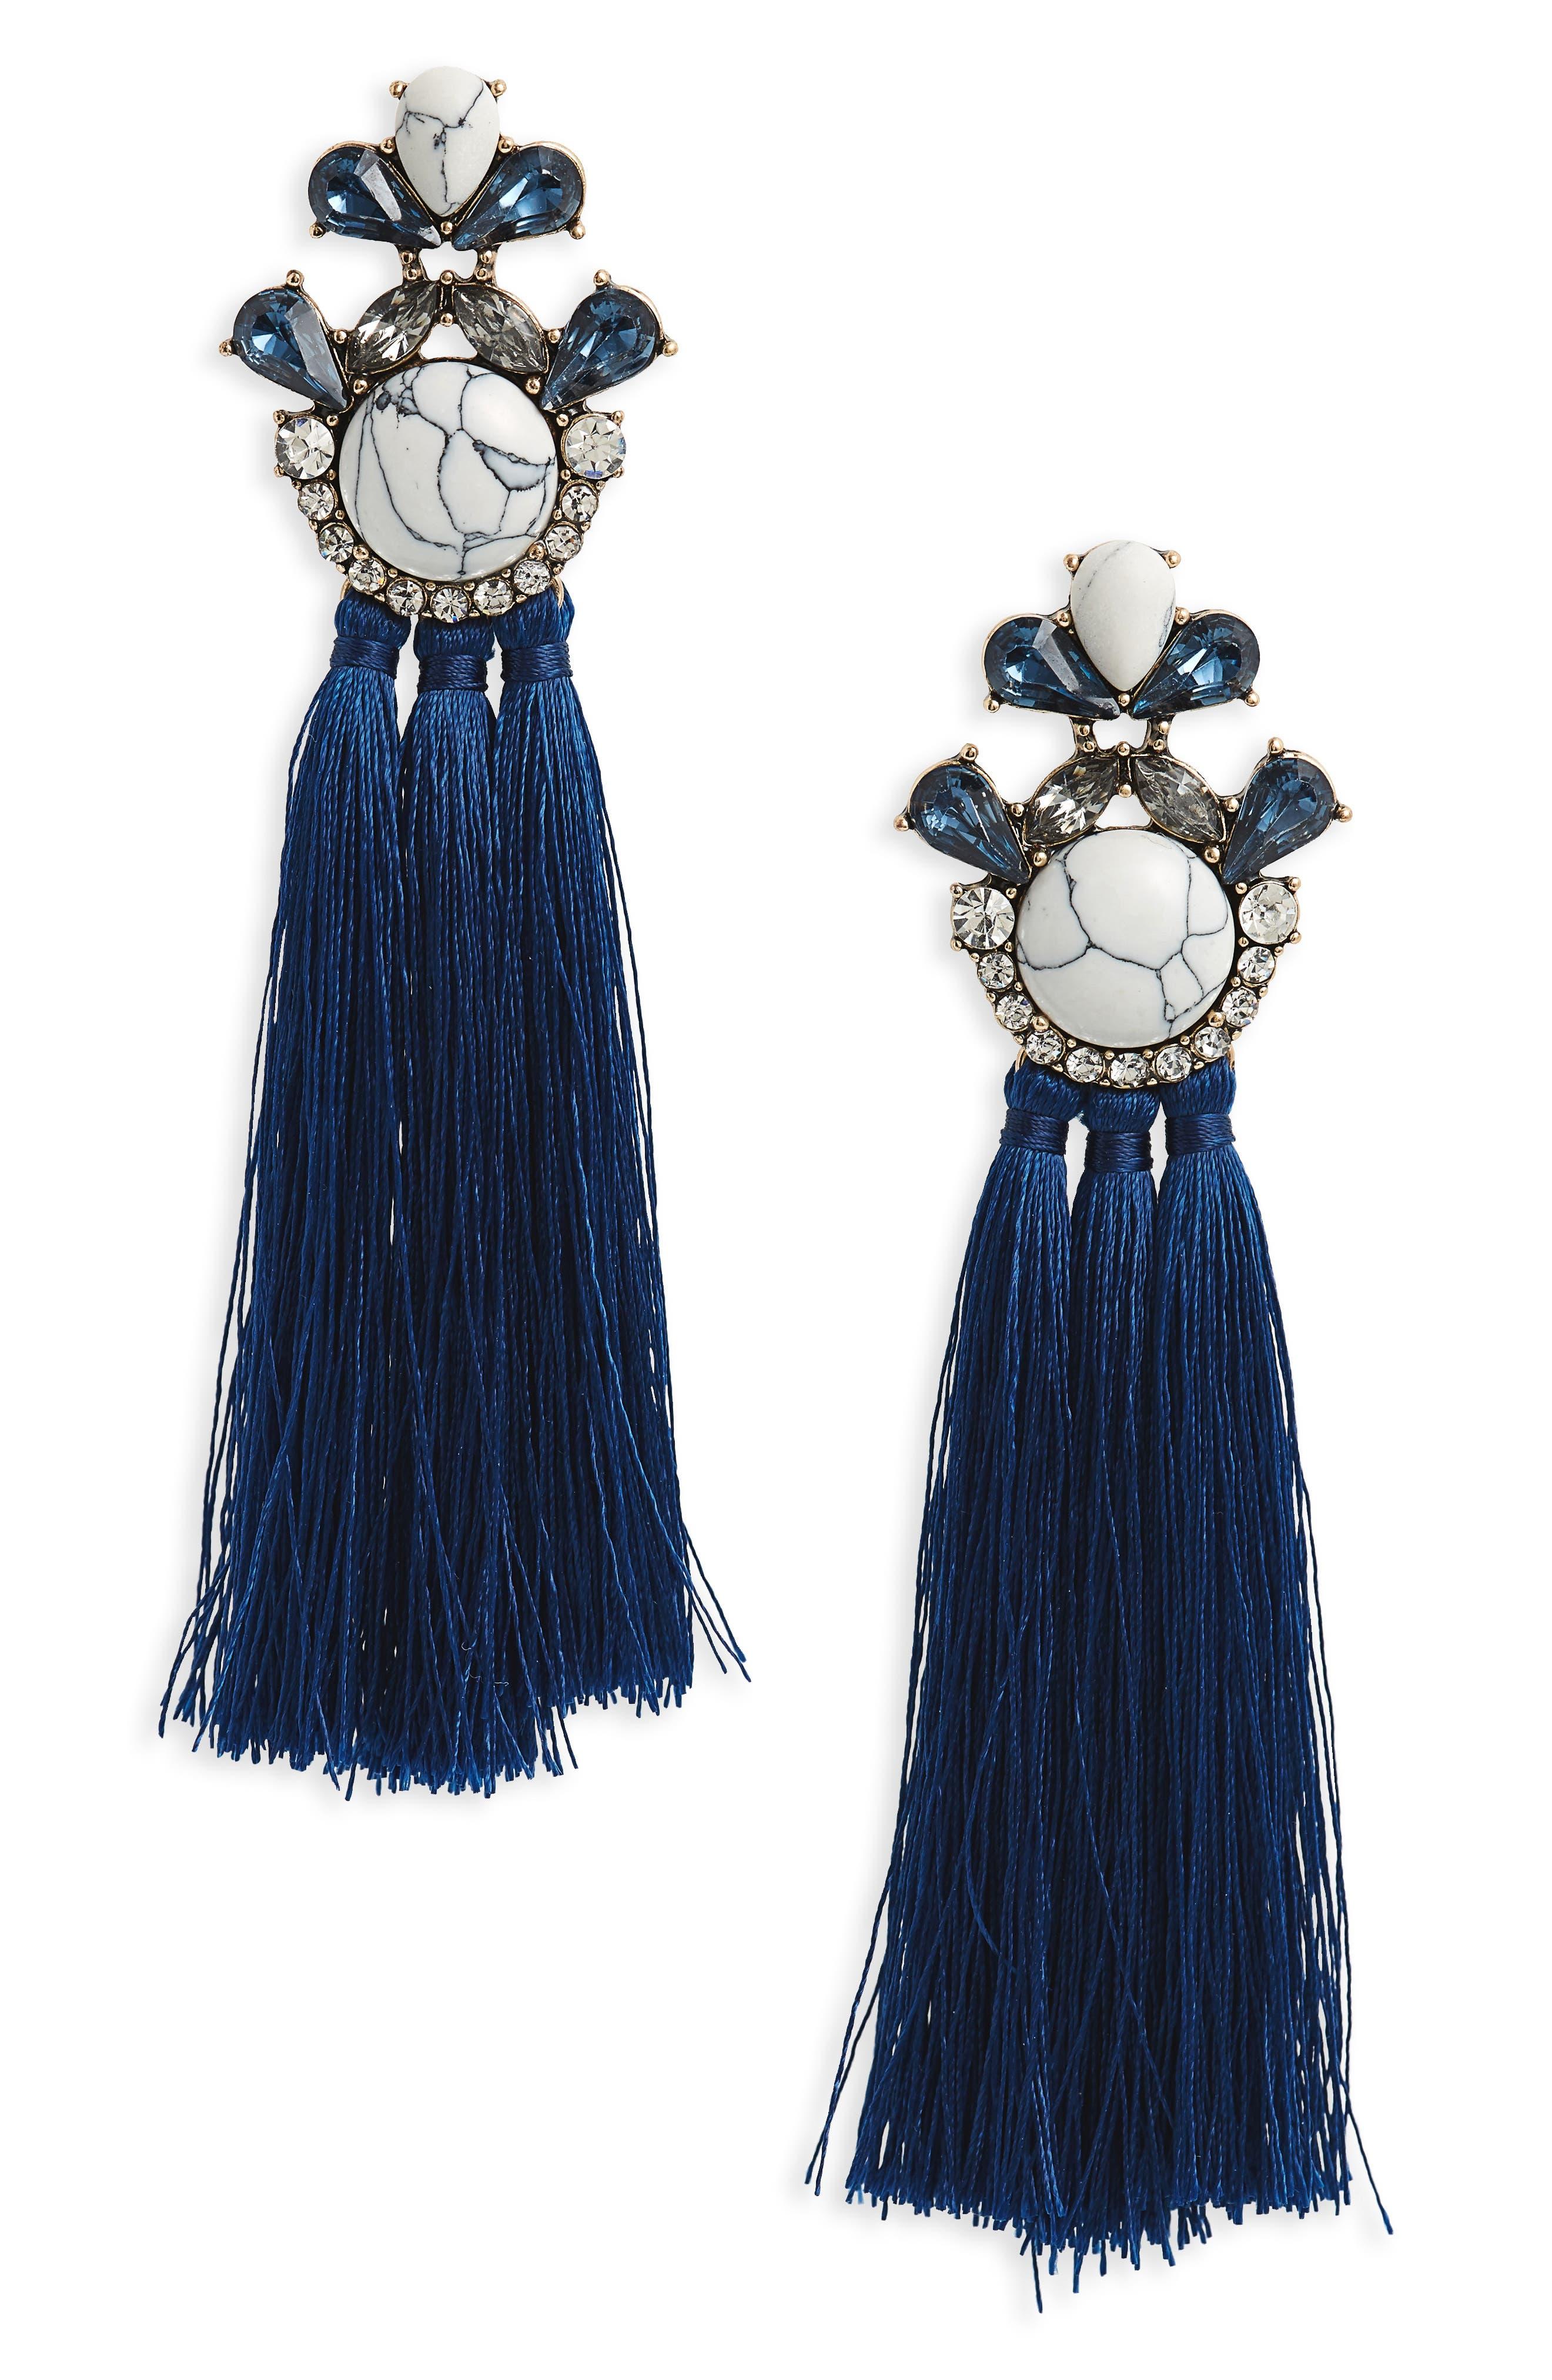 Marble & Crystal Tassel Earrings,                             Main thumbnail 1, color,                             100